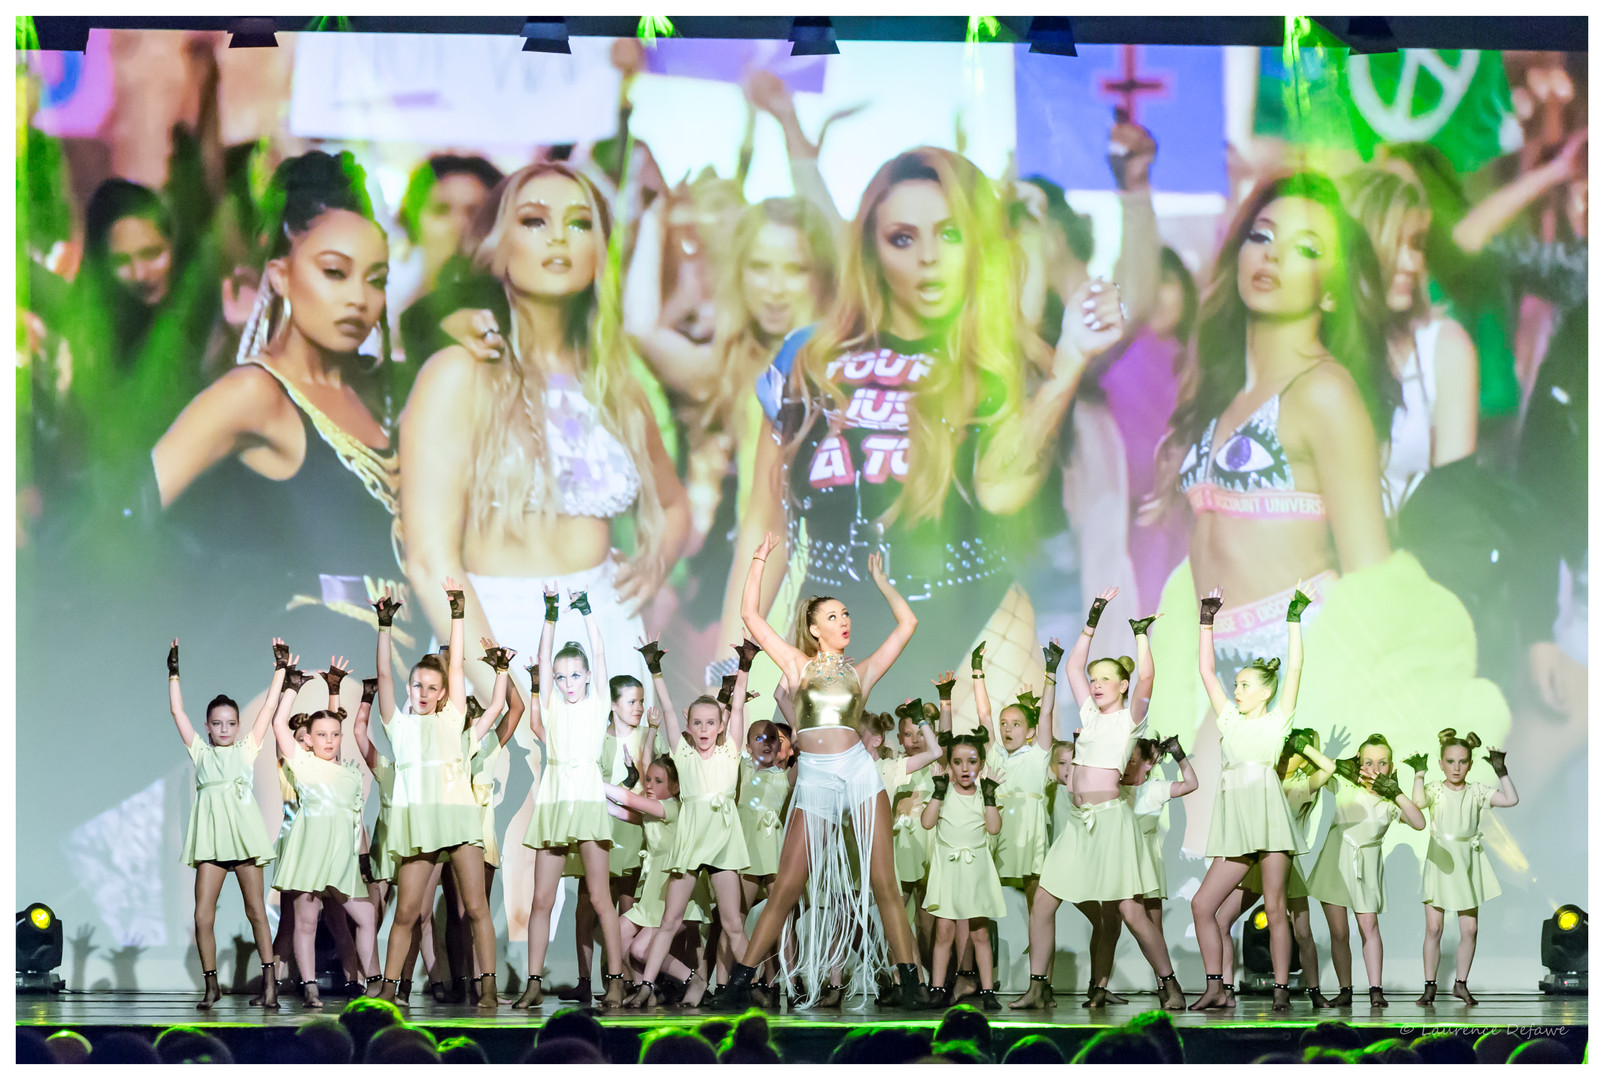 Start2dance